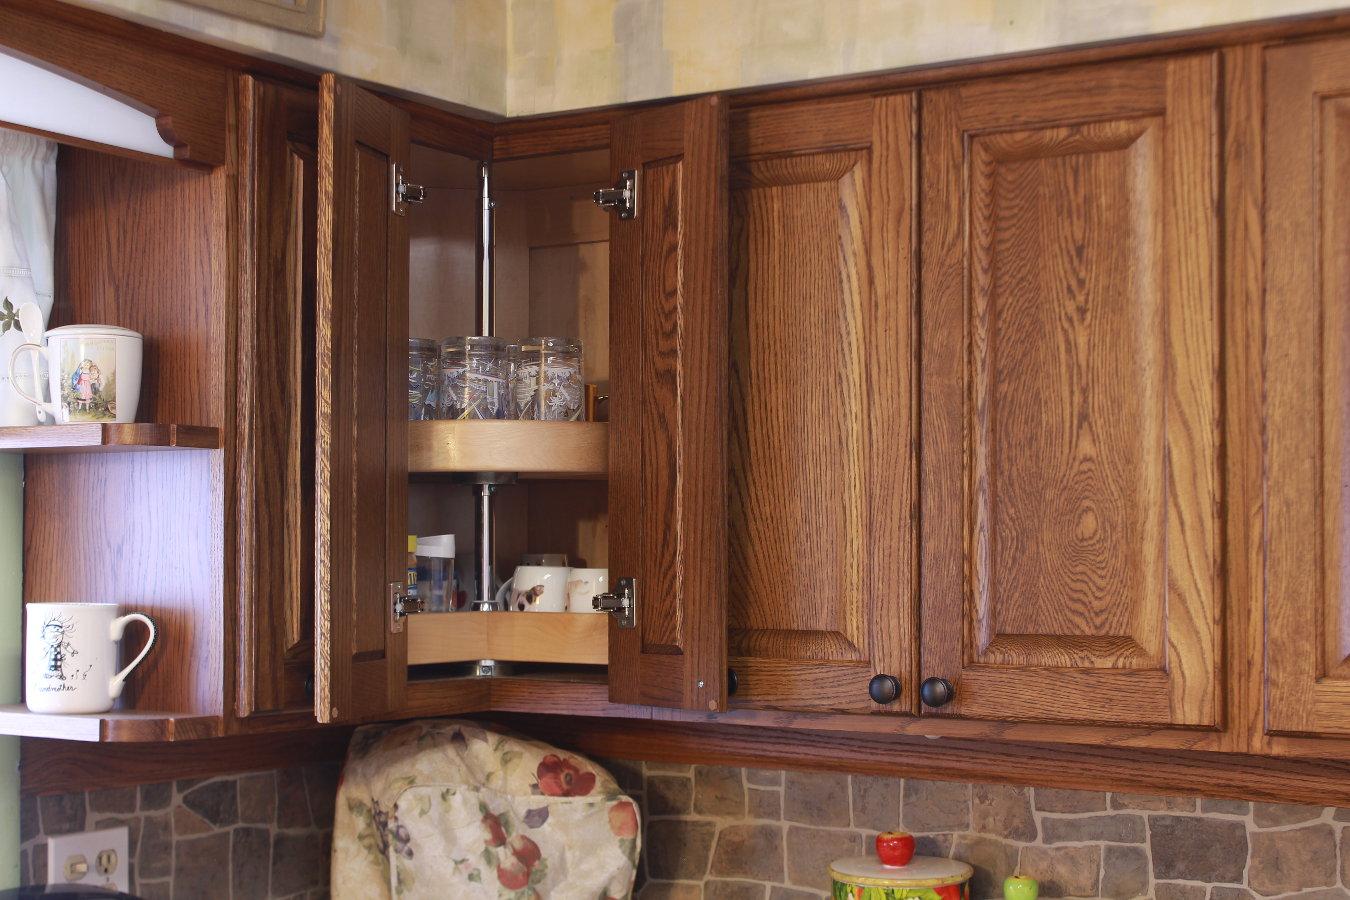 Lazy susans for kitchen cabinets lazy susan kitchen - Lazy susan kitchen cabinets ...